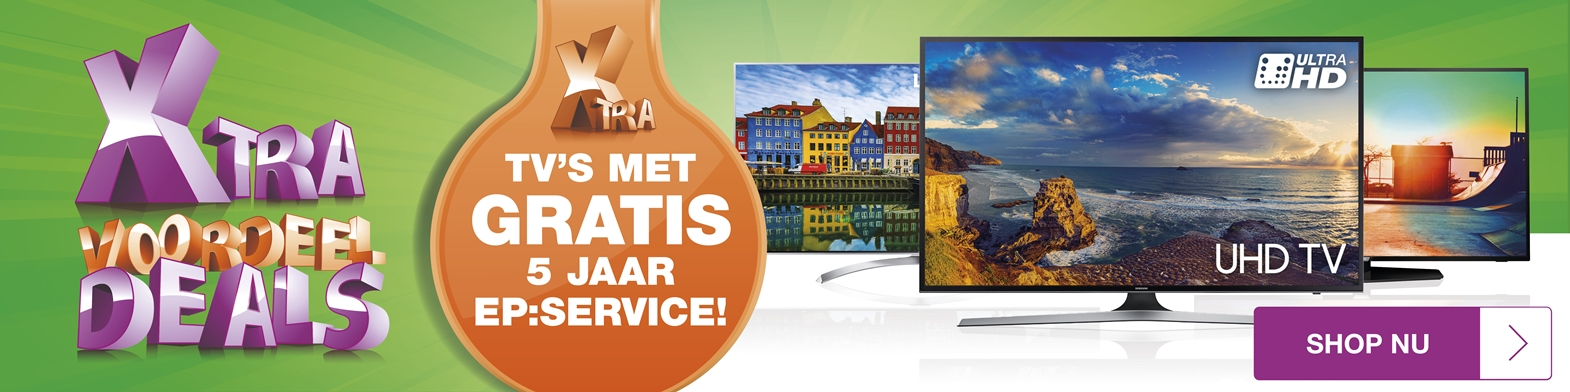 tv's met gratis serviceplan